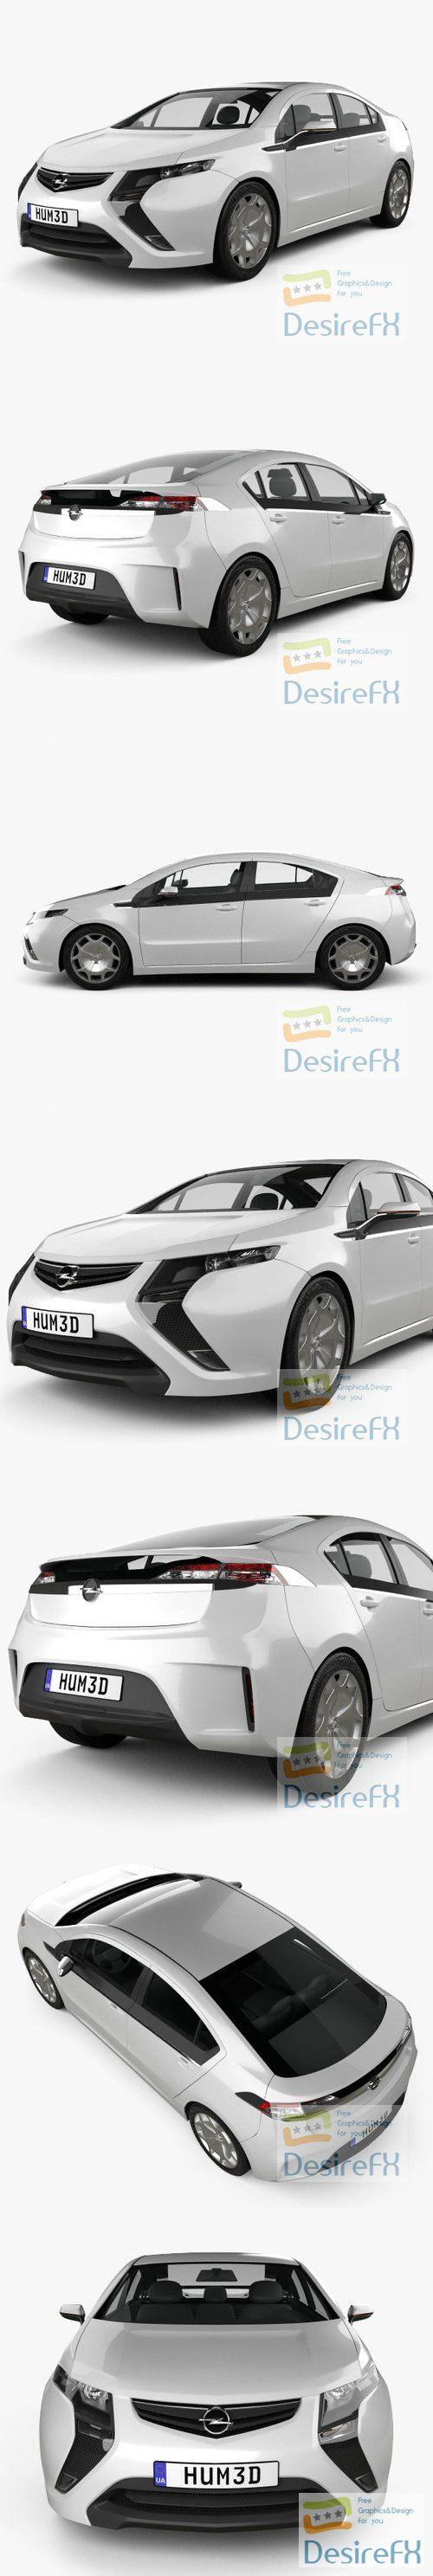 Opel Ampera 2011 3D Model